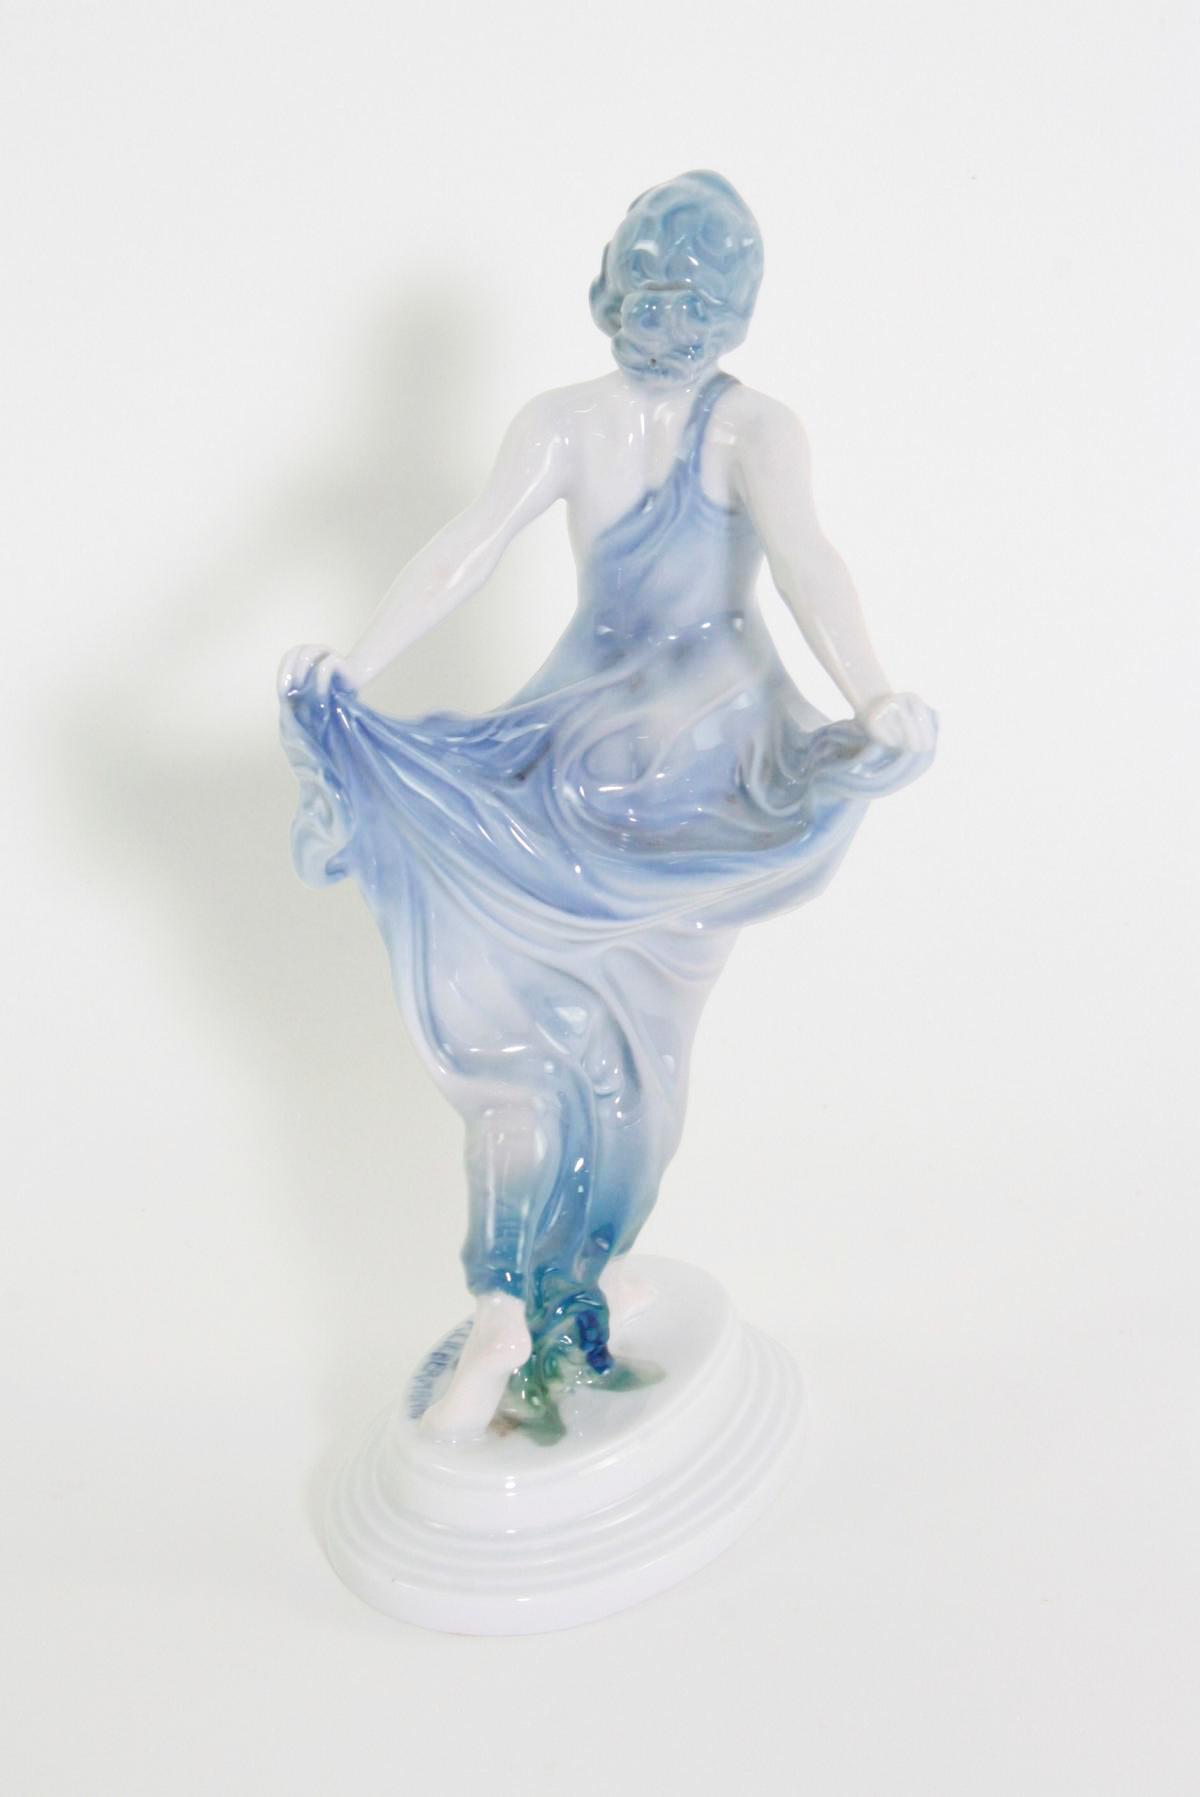 Porzellanskulptur, 'Tänzerin', Rosenthal, Kunst-Abteilung, 1920er Jahre-4